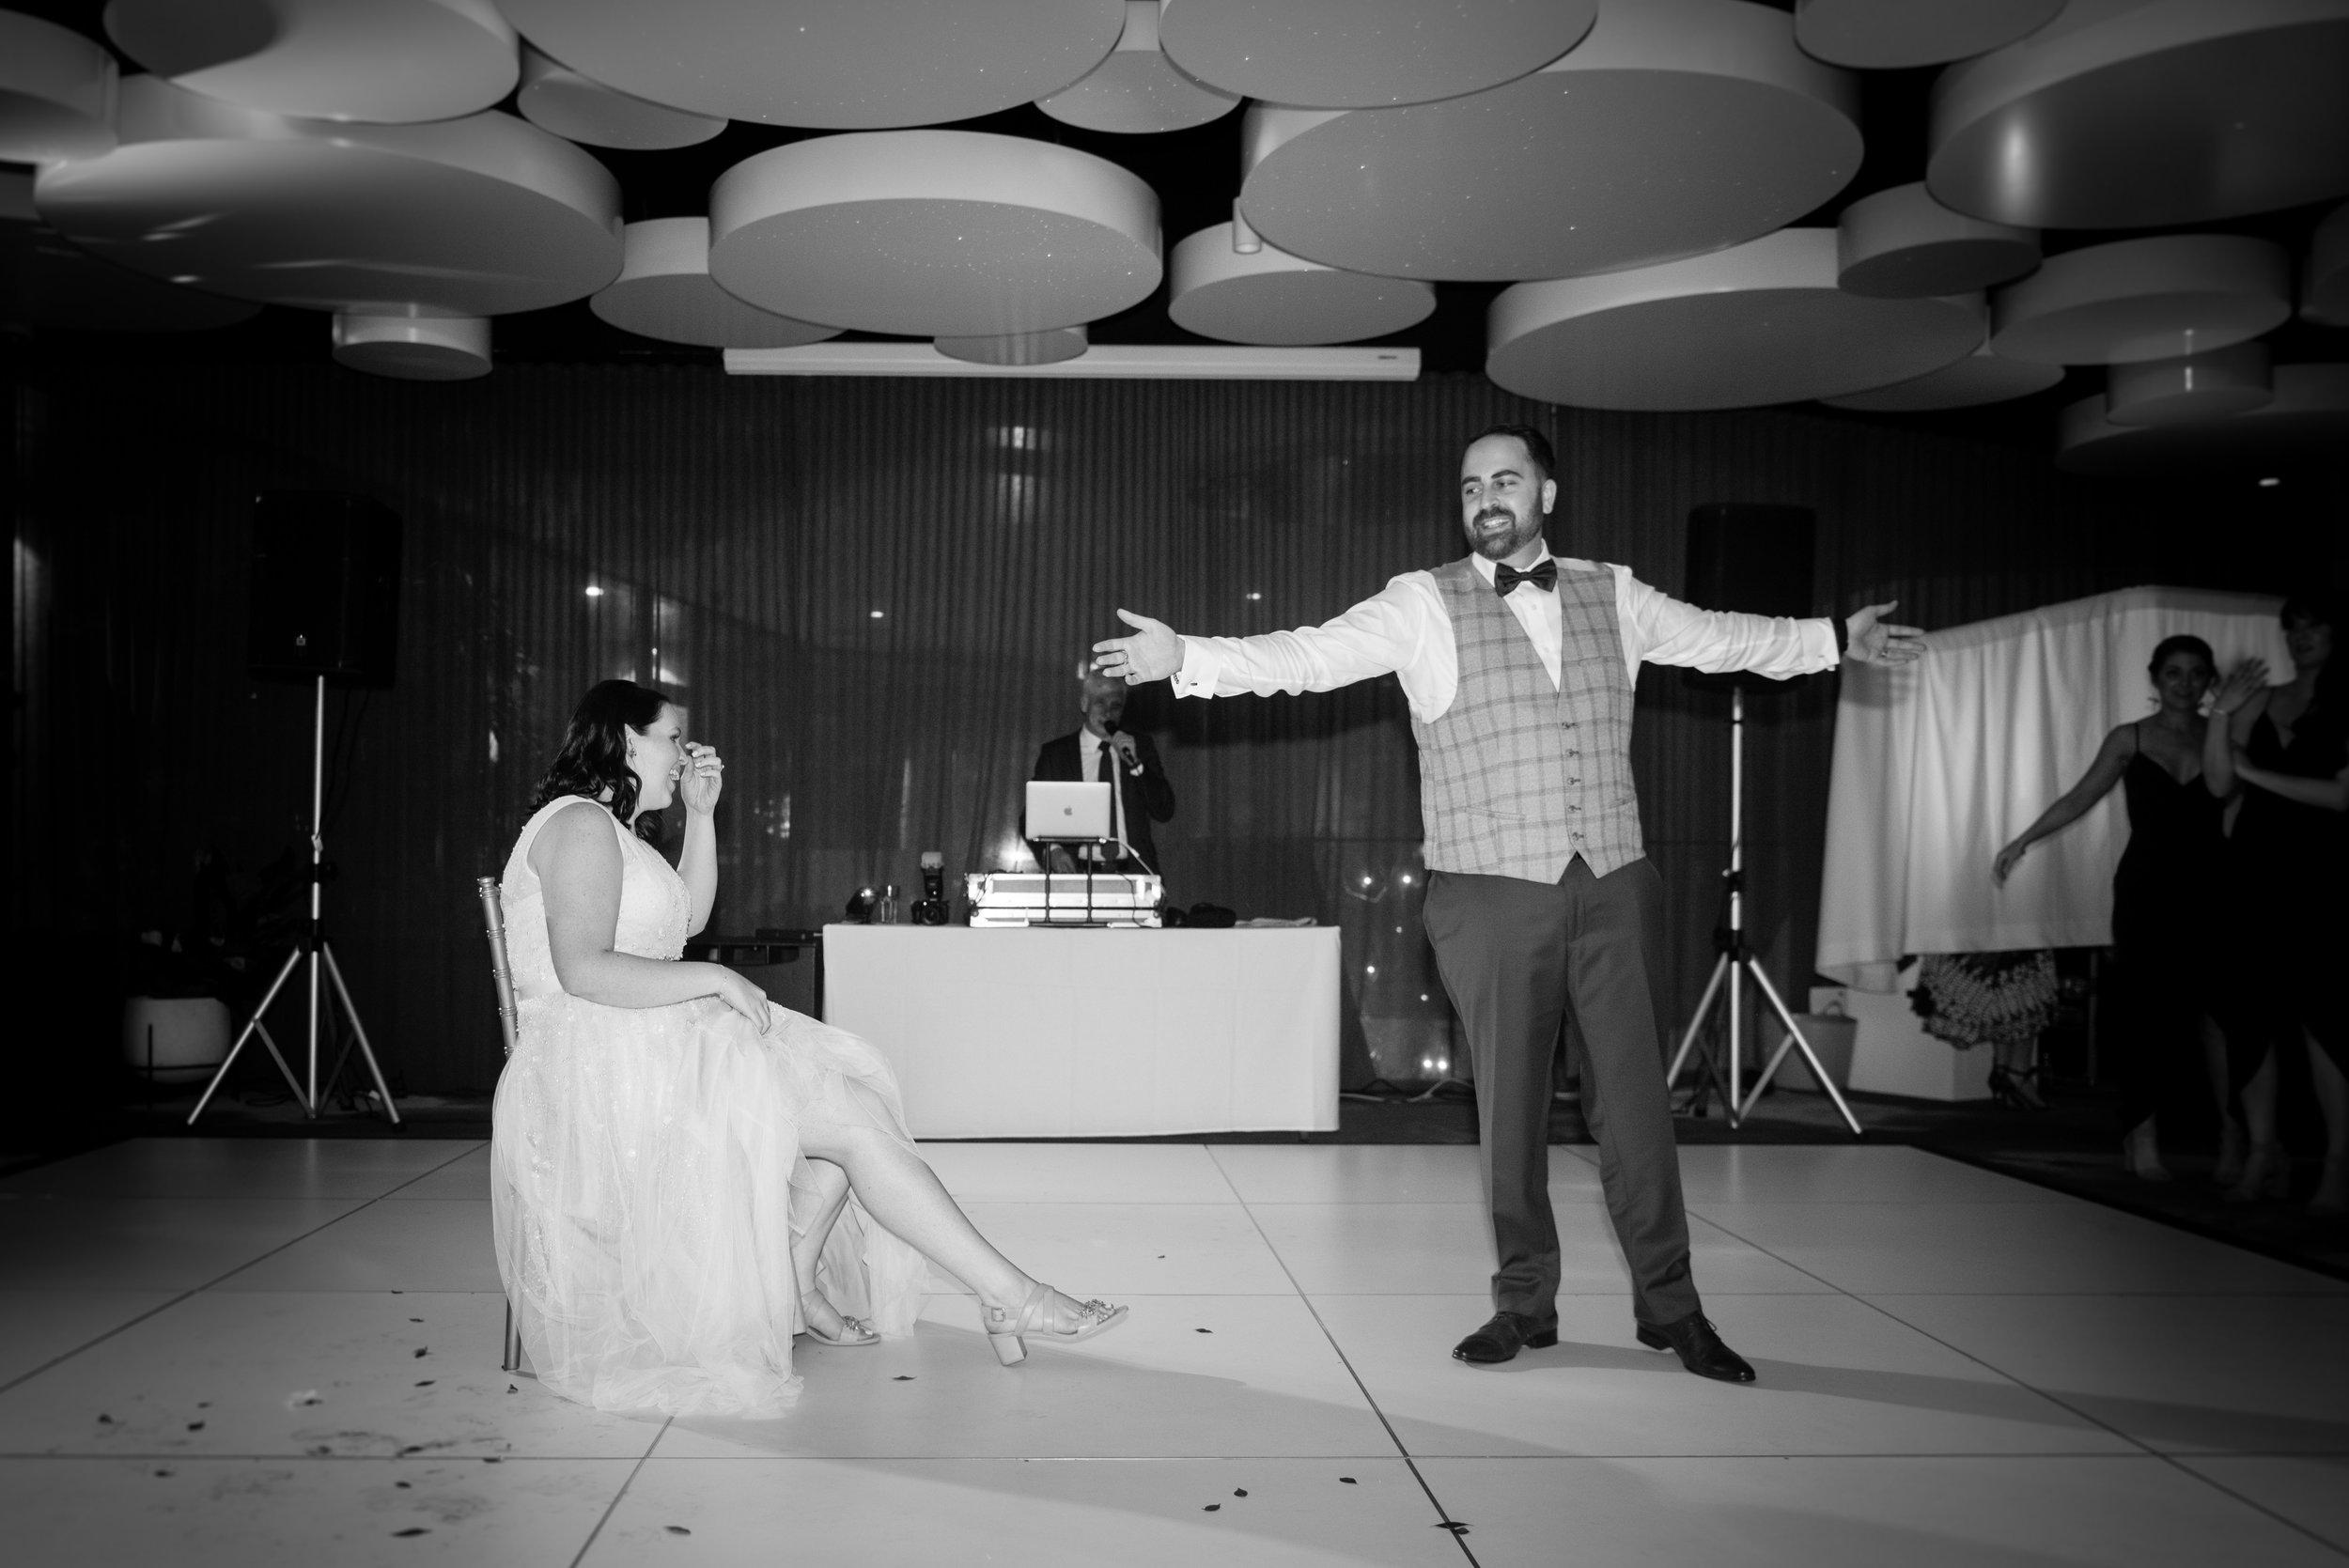 brisbane-city-wedding-photographer-romantic-wedding-139.jpg